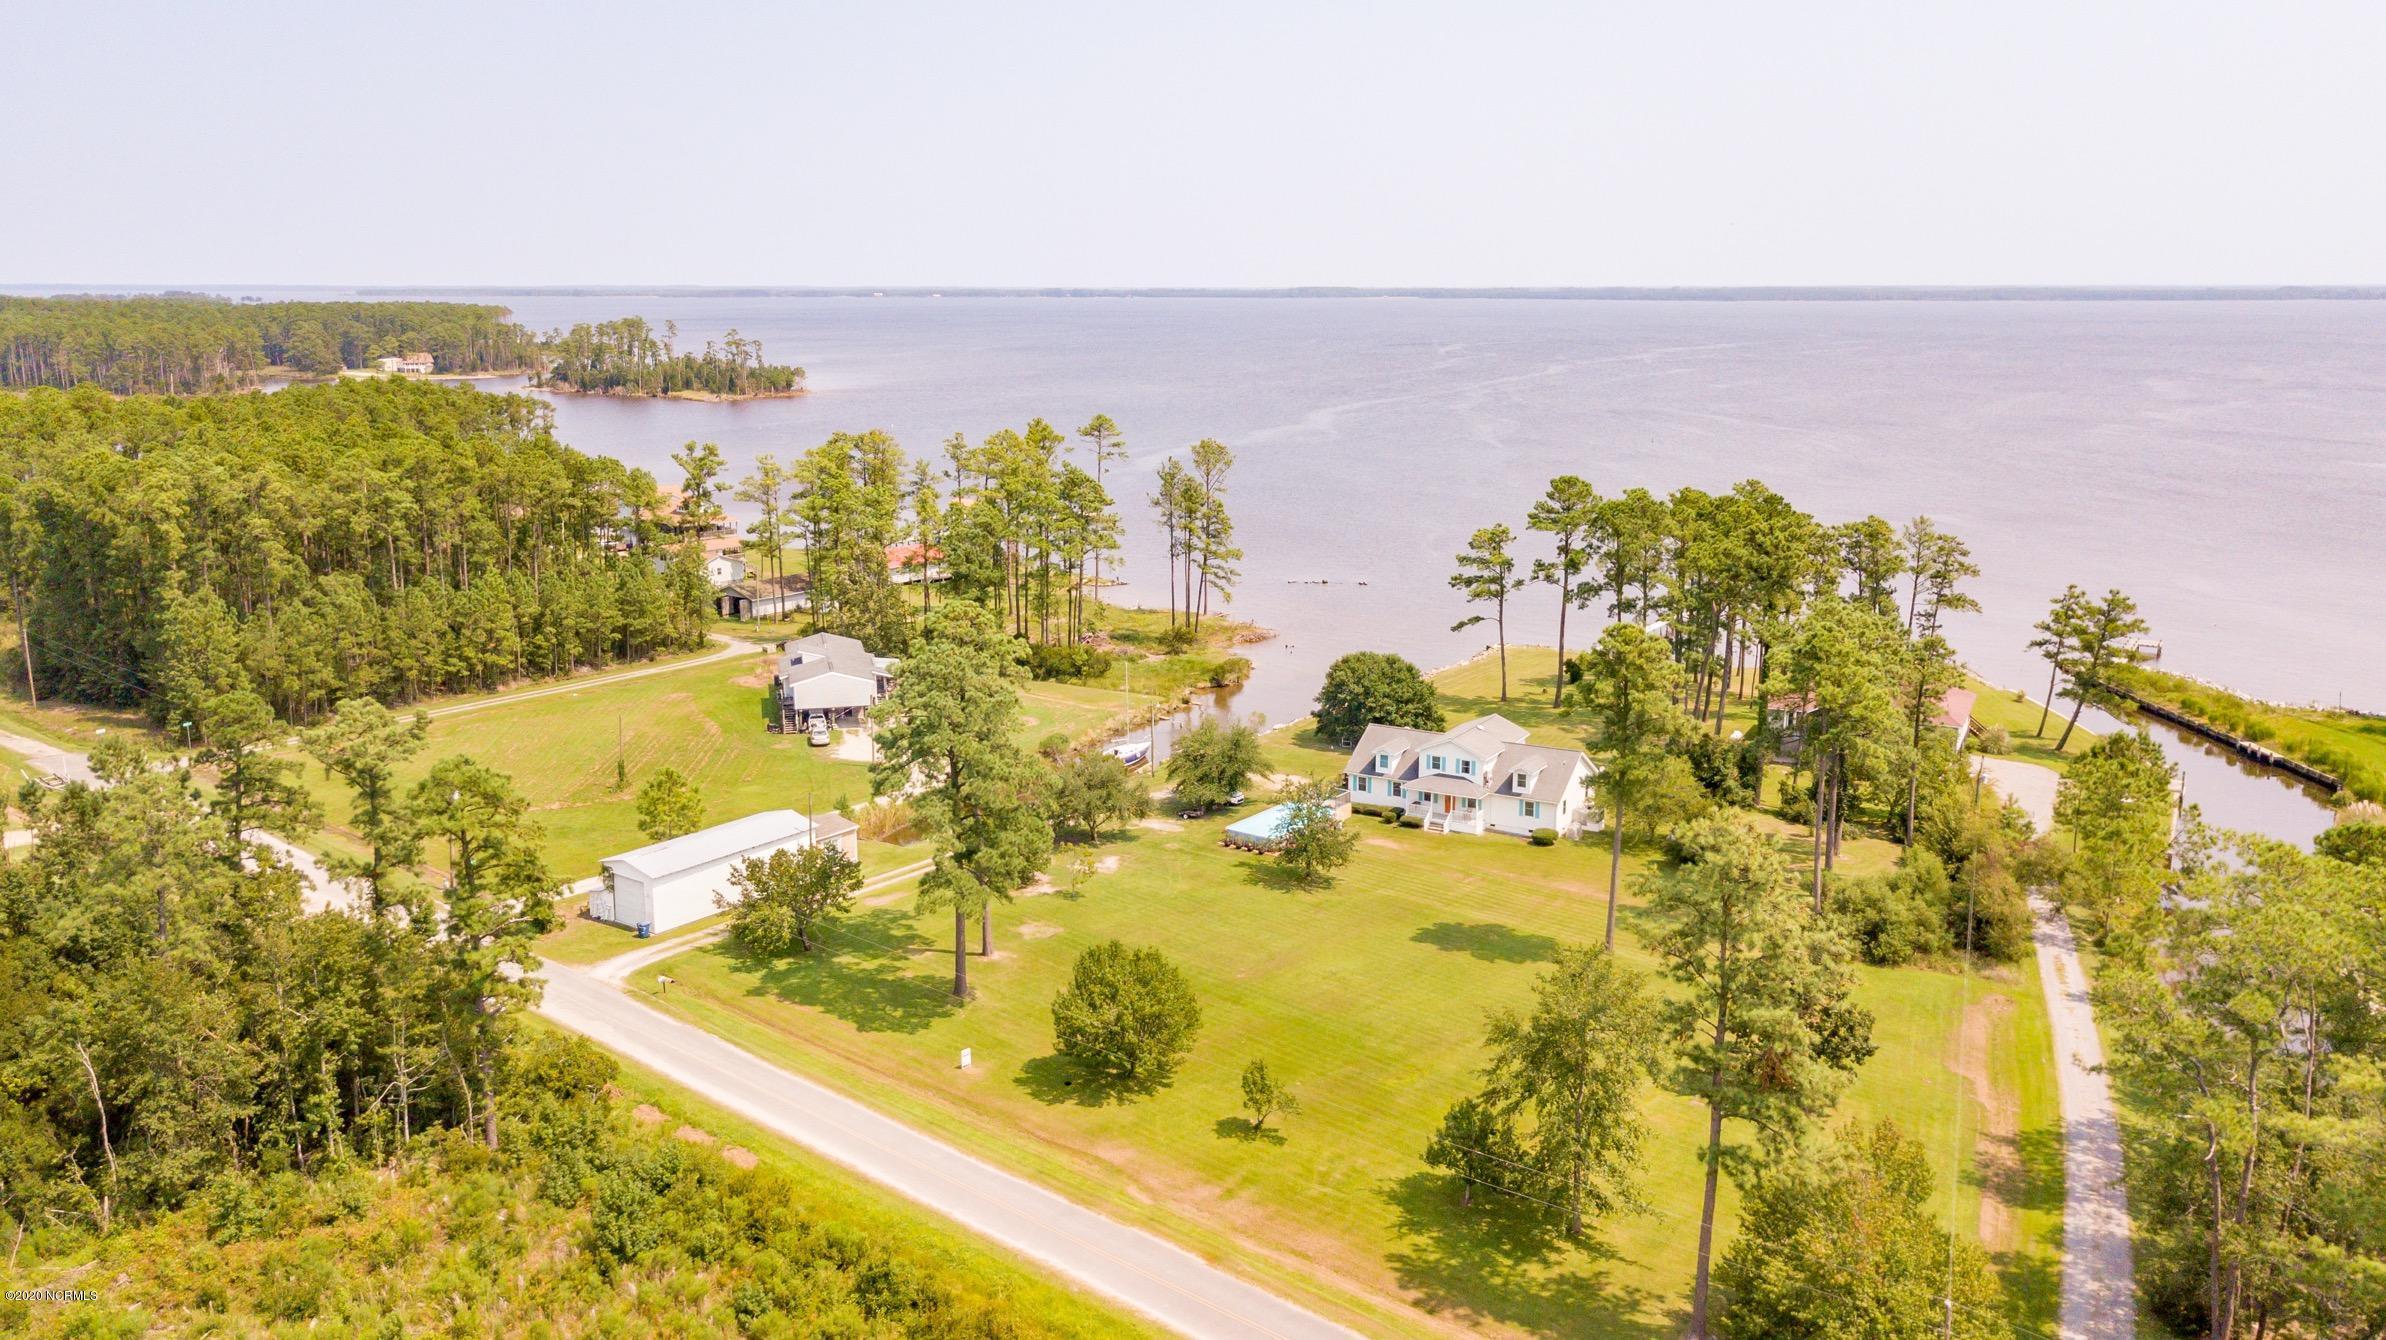 284 Shoreline Drive, Belhaven, North Carolina 27810, 2 Bedrooms Bedrooms, 9 Rooms Rooms,2 BathroomsBathrooms,Single family residence,For sale,Shoreline,100196783